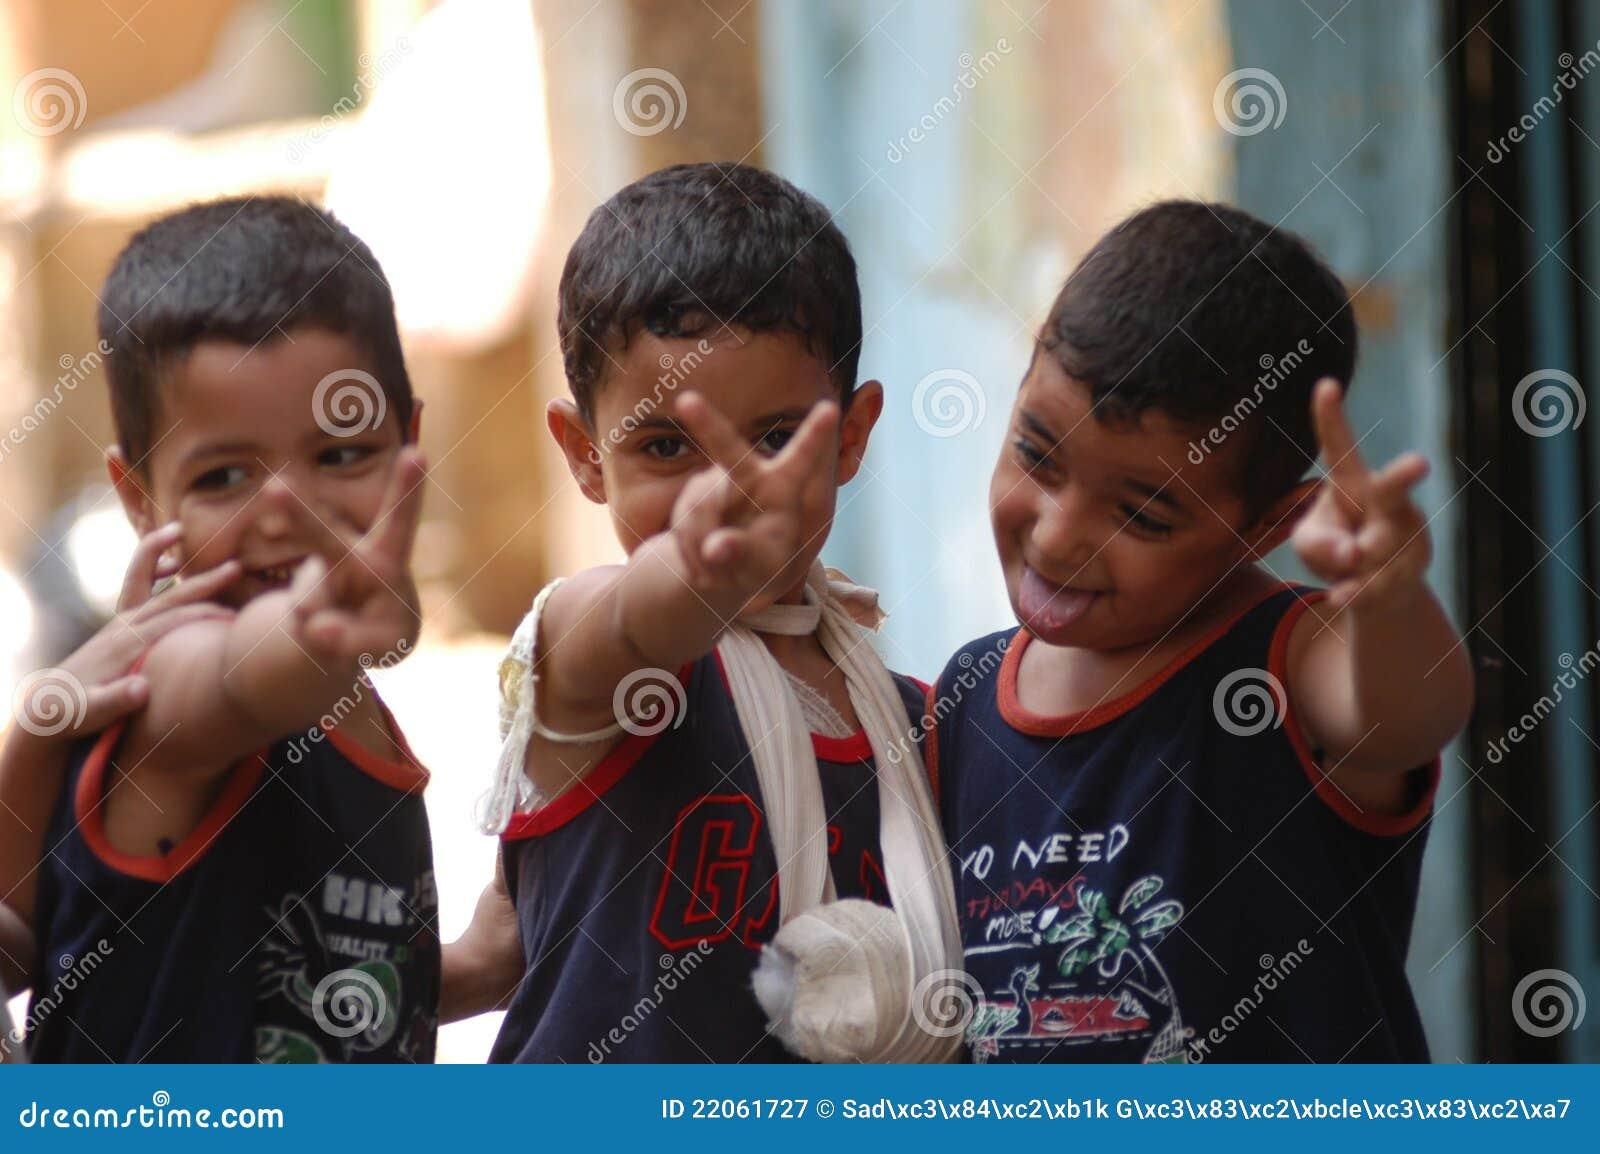 Children in Palestinian Camp